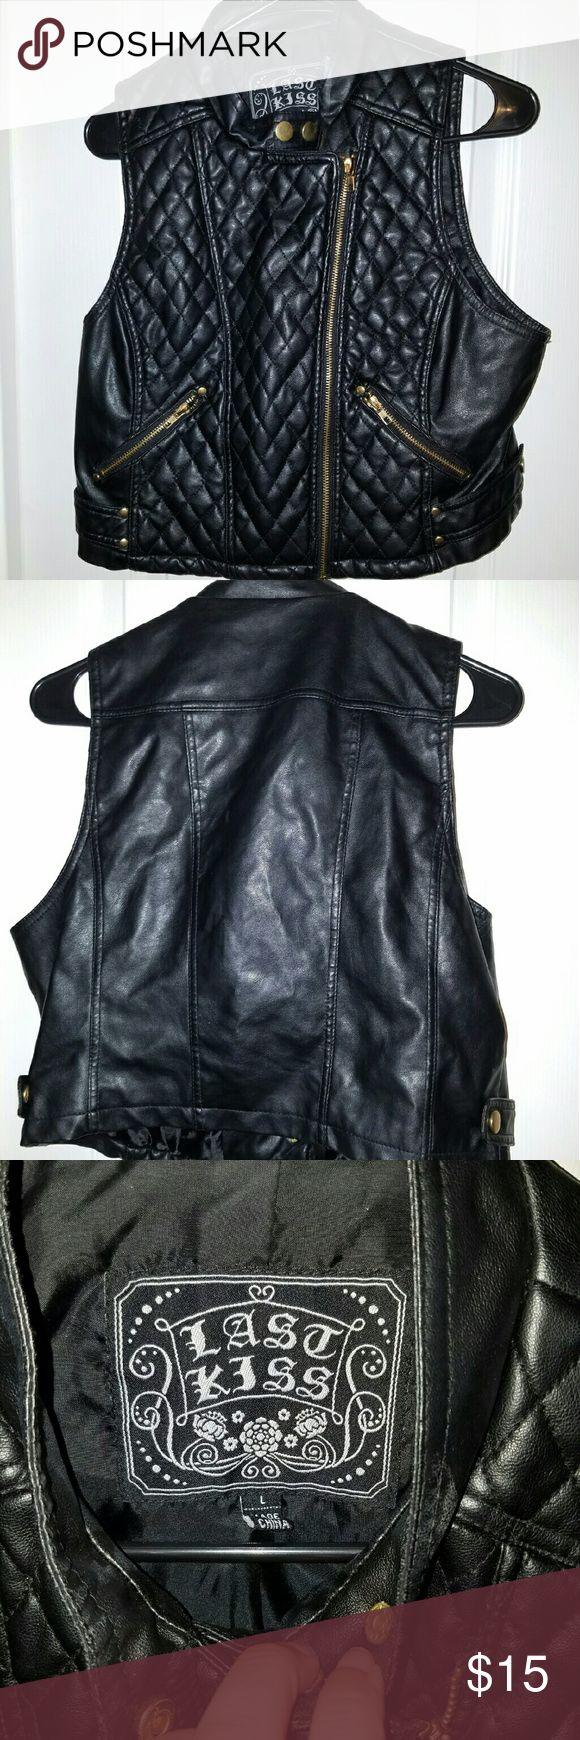 Vest faux leather biker vest Biker vest adds a little edge to your wardrobe faux leather quilted Jackets & Coats Vests